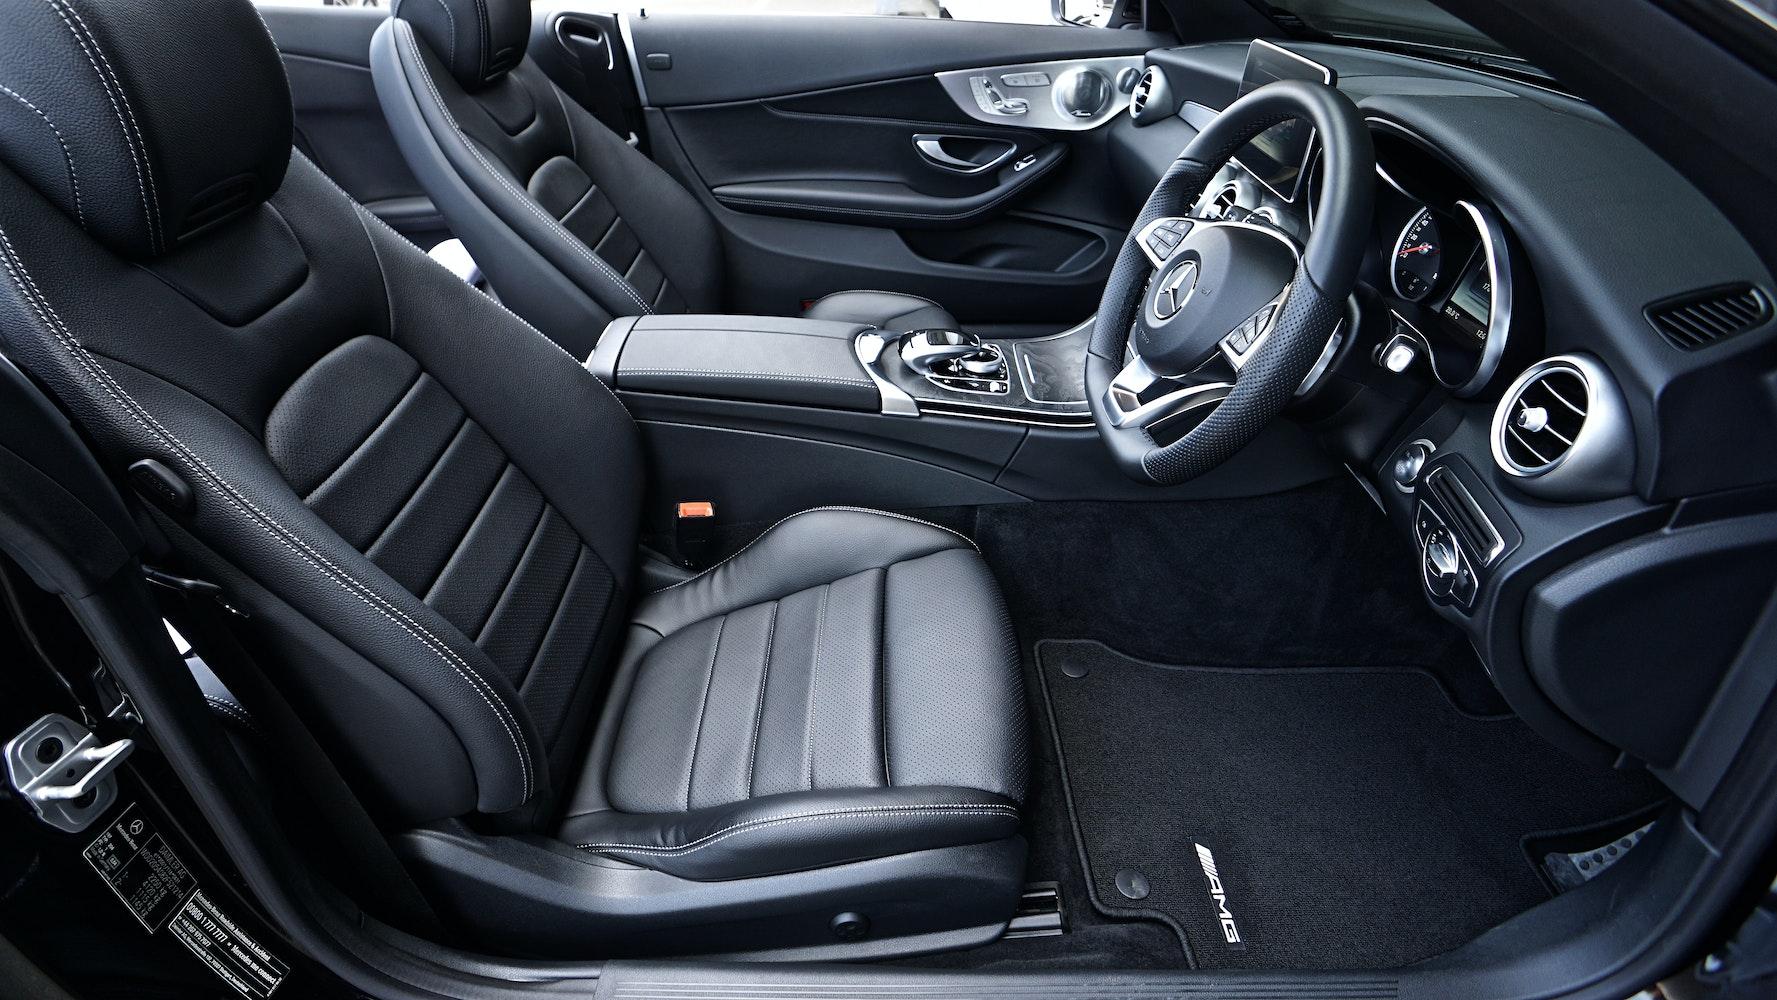 1000 interesting car interior photos · pexels · free stock photos